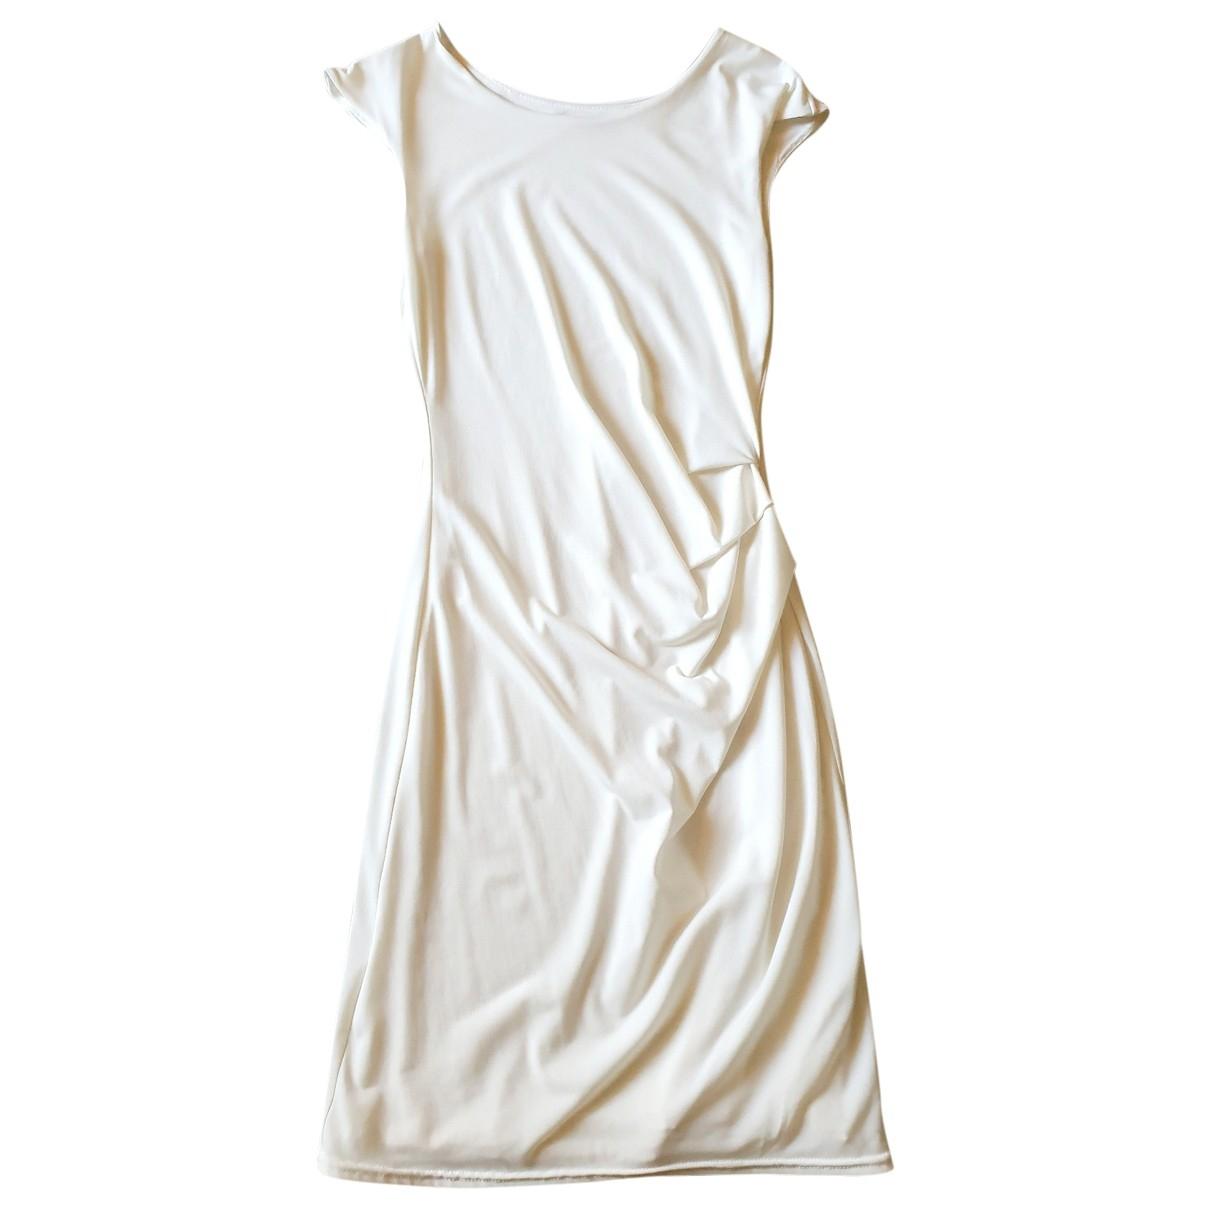 Zapa \N Kleid in  Weiss Polyester